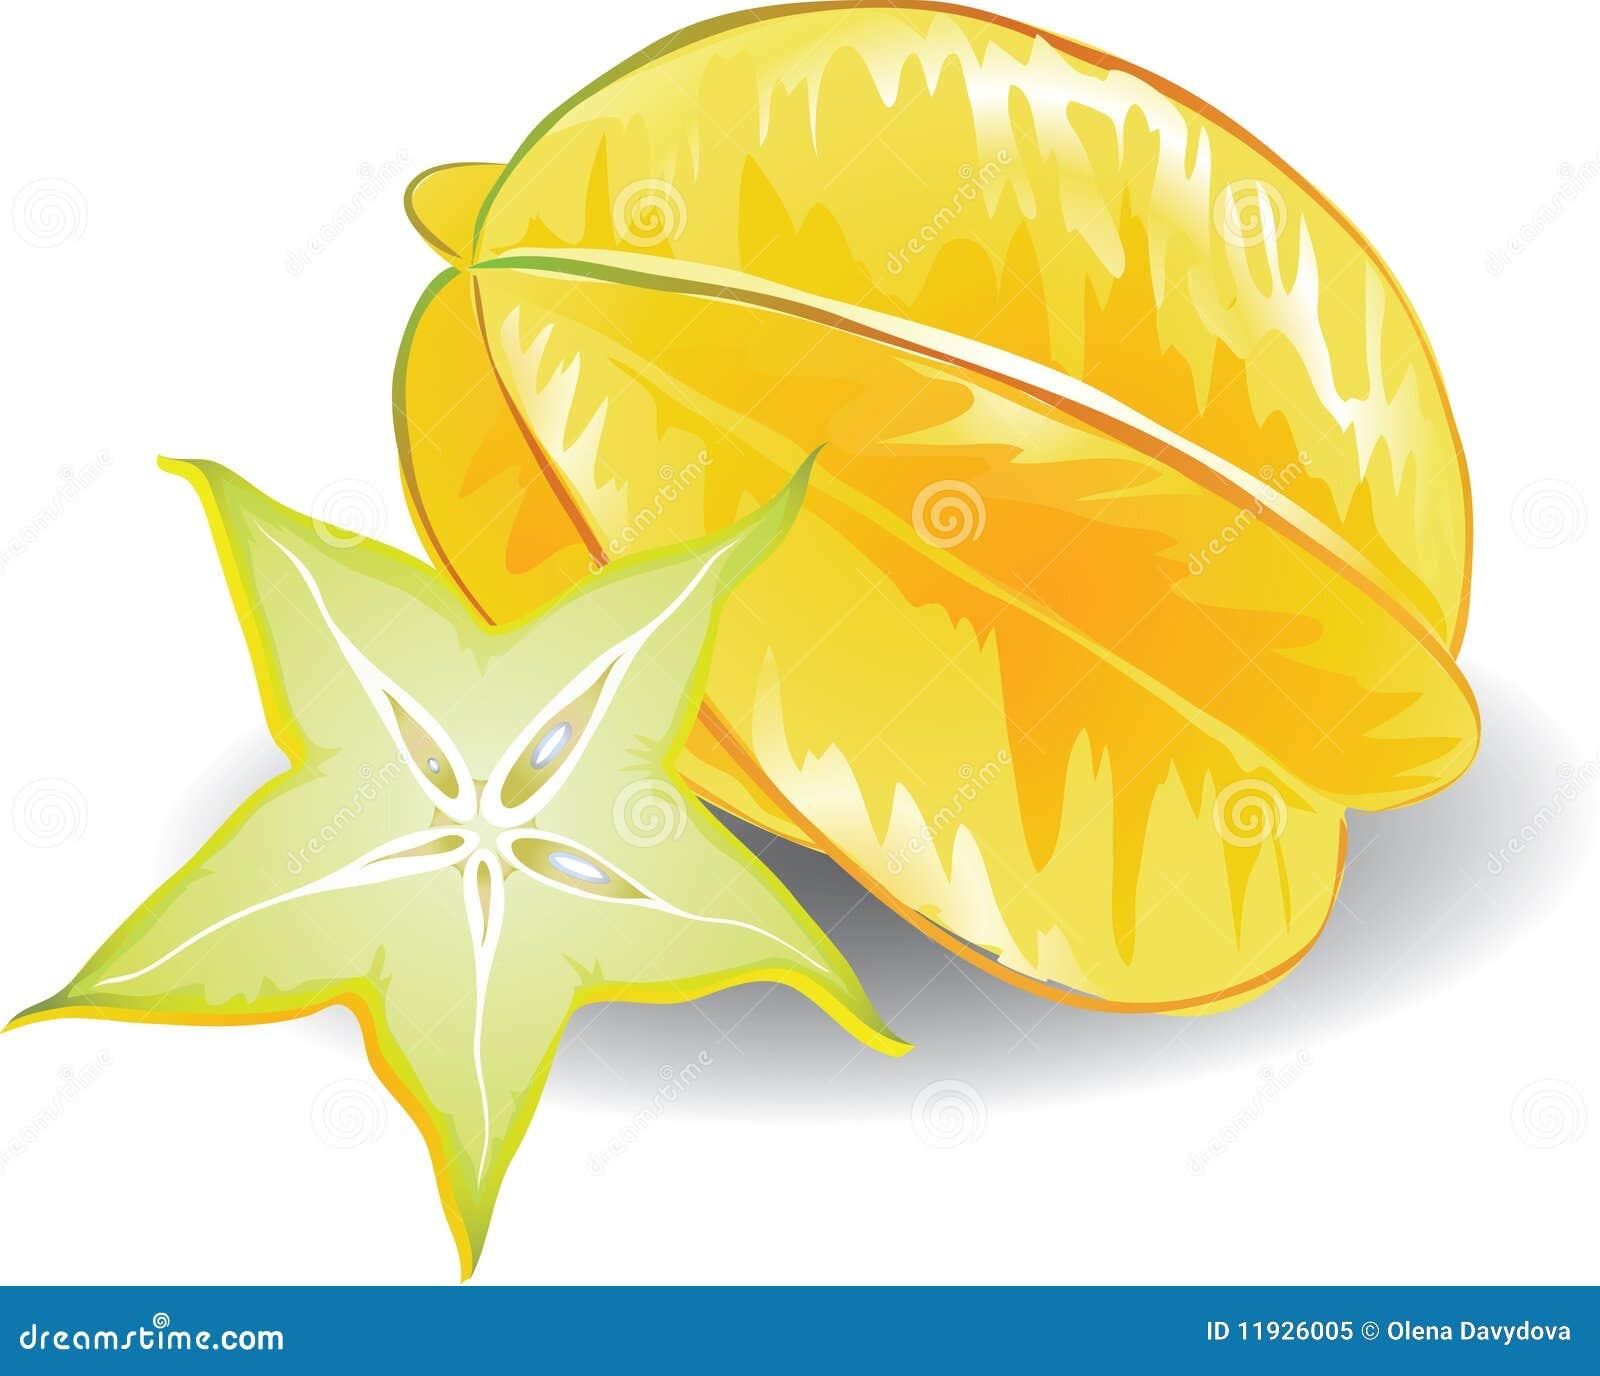 starfruit seeds